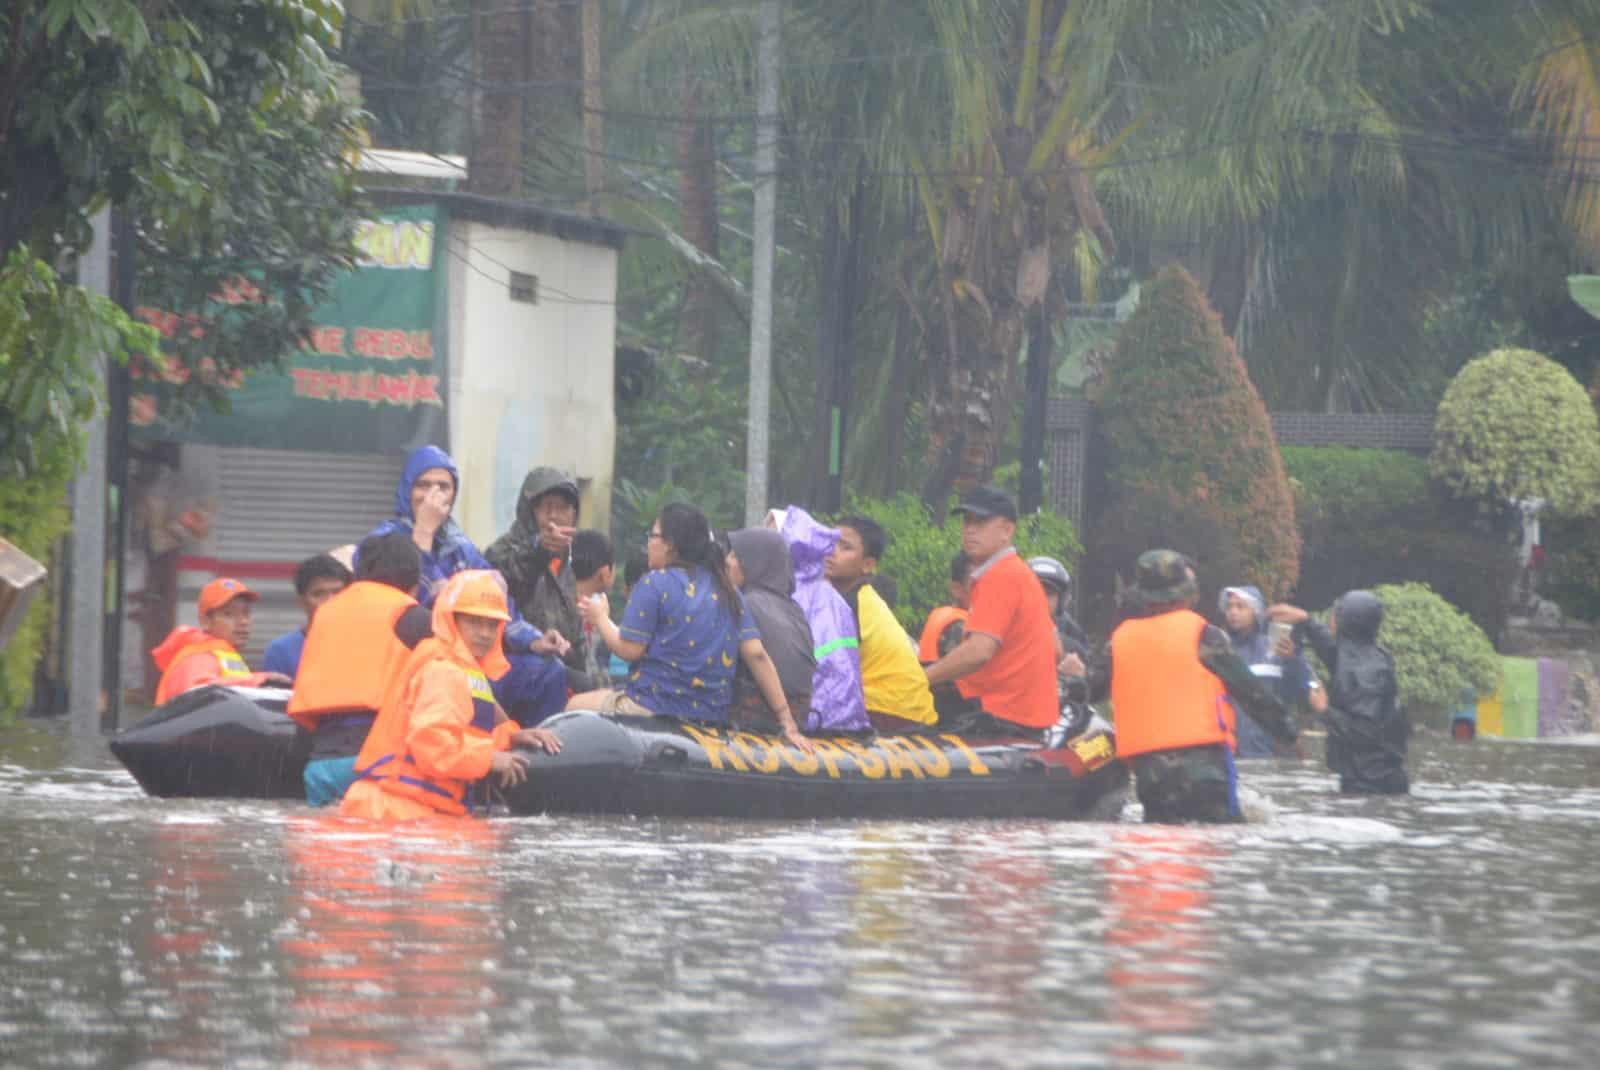 Operasi Tanggap Bencana Banjir Koopsau I, Evakuasi Warga Kec Makasar